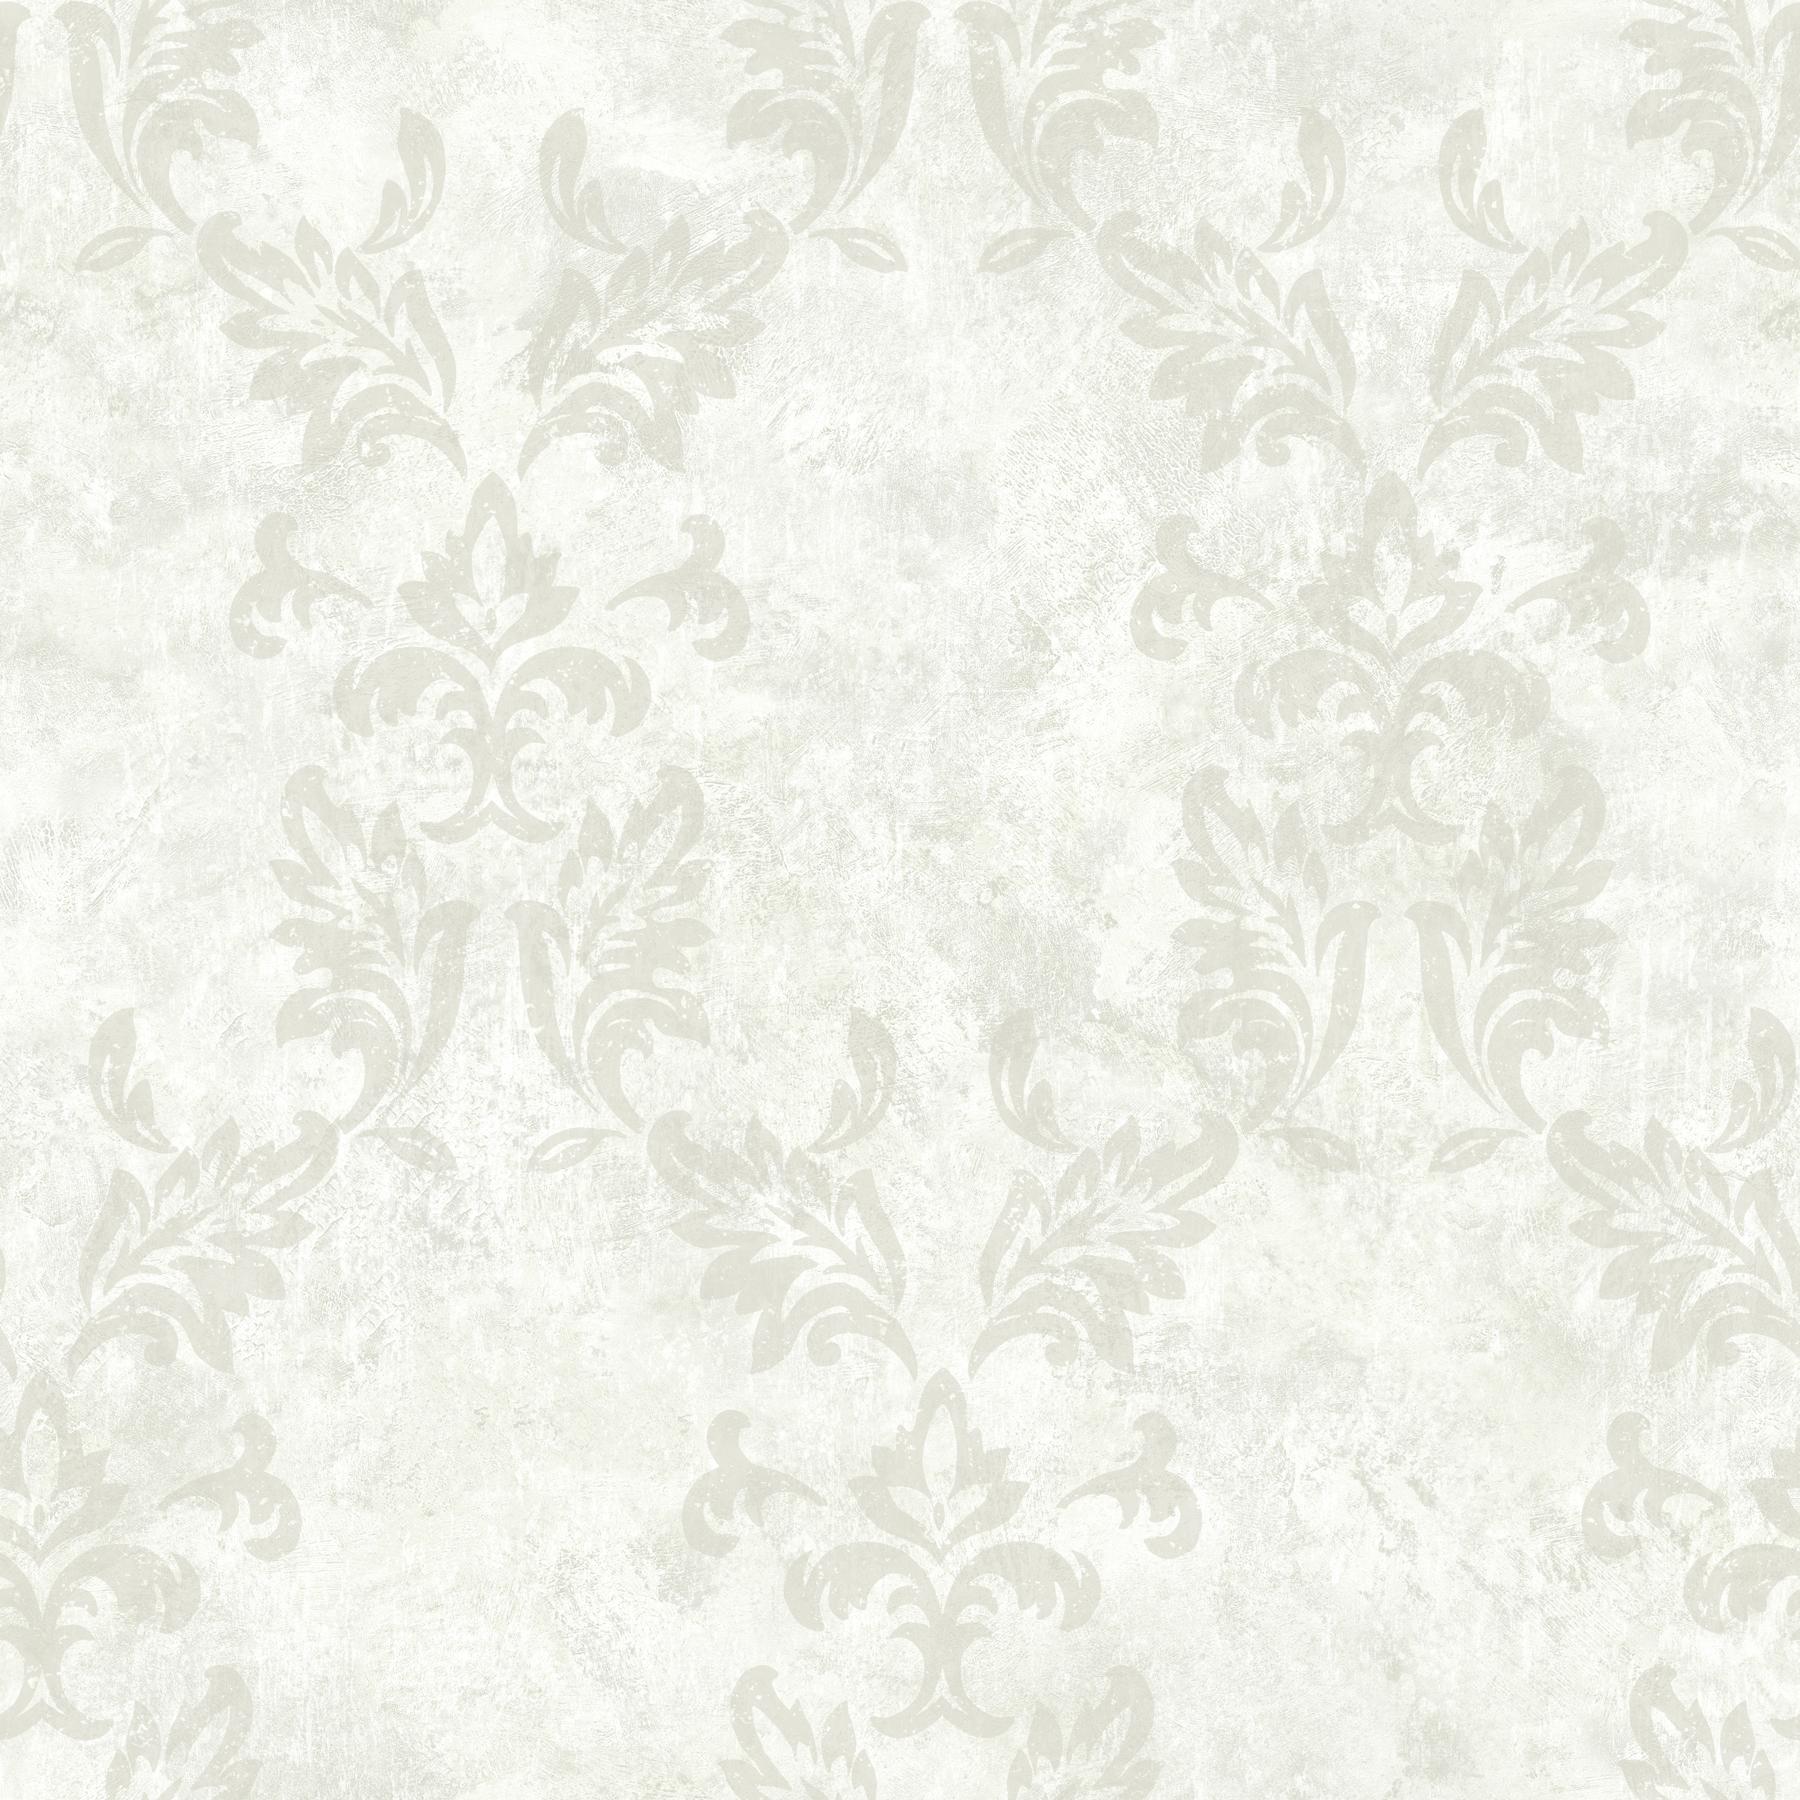 Picture of Bentley Cream Damask Wallpaper